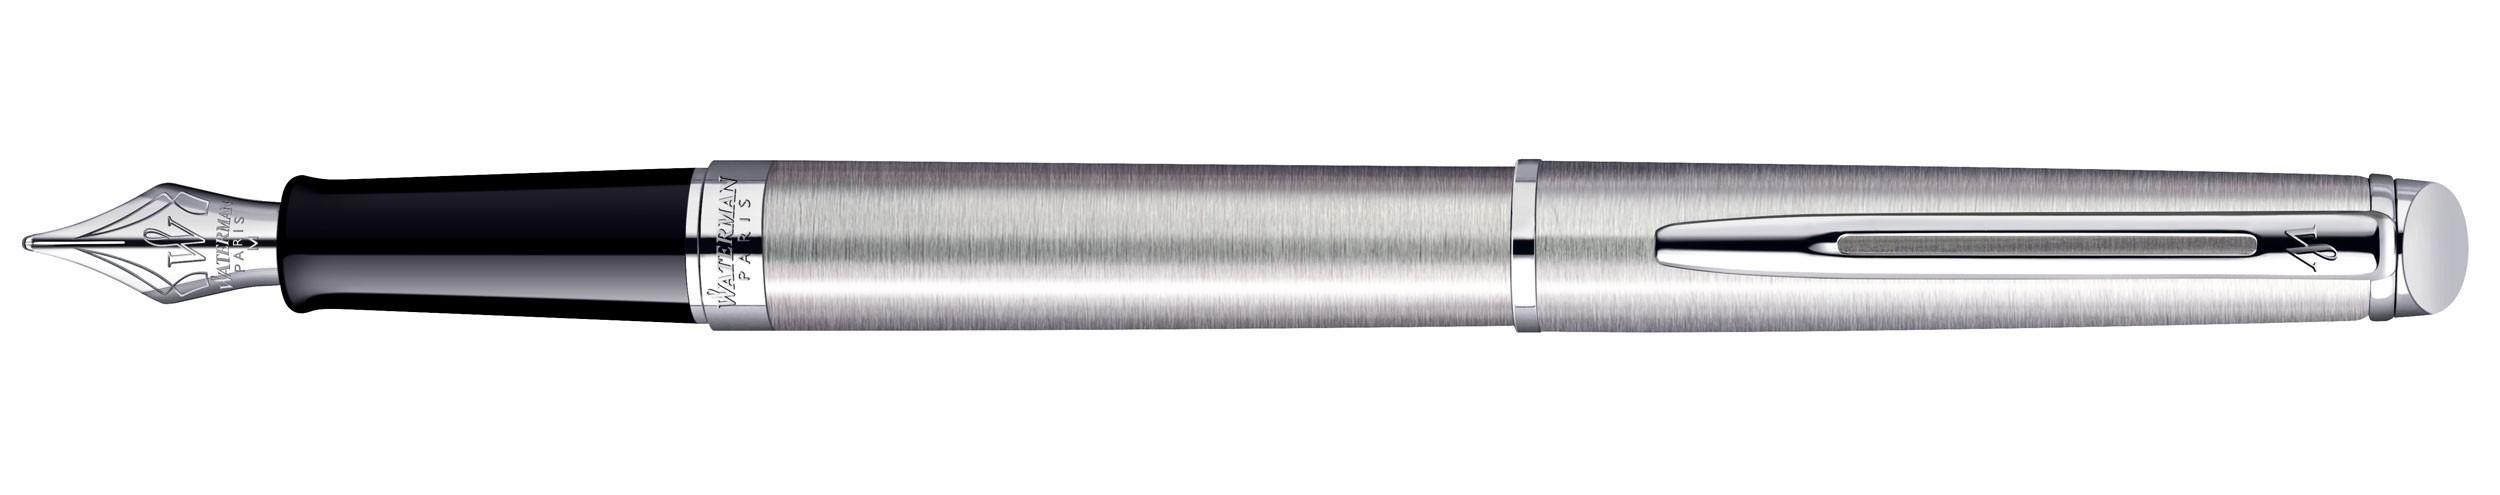 Перьевая ручка Waterman Hemisphere